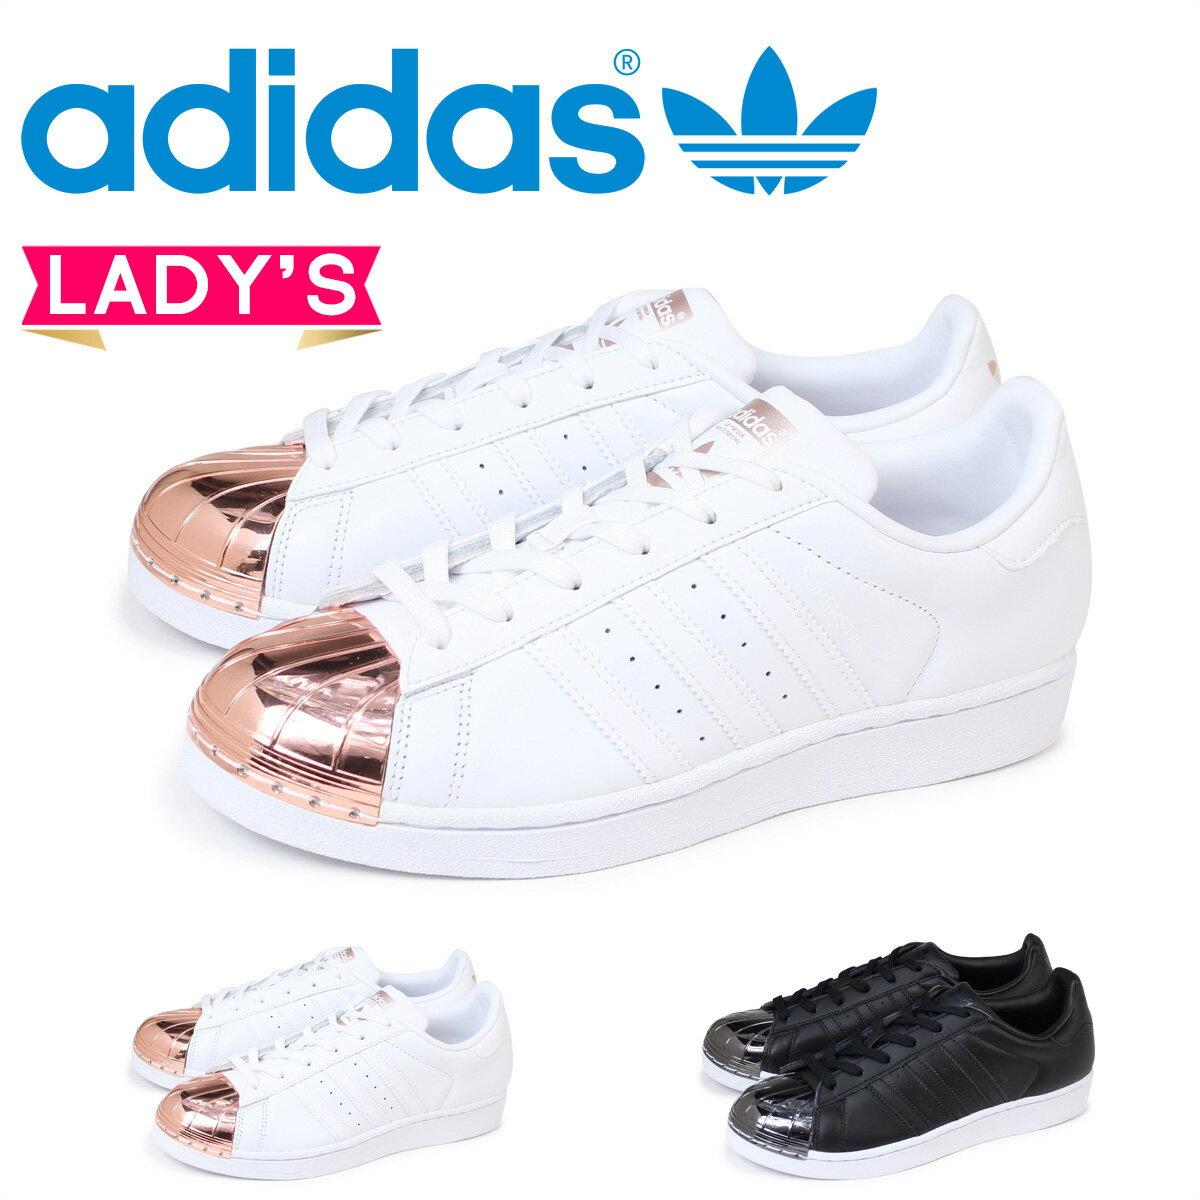 adidas スーパースター レディース スニーカー アディダス Originals SUPERSTAR METAL TOE W BY2882 BY2883 靴 ホワイト ブラック オリジナルス 【CLEARANCE】